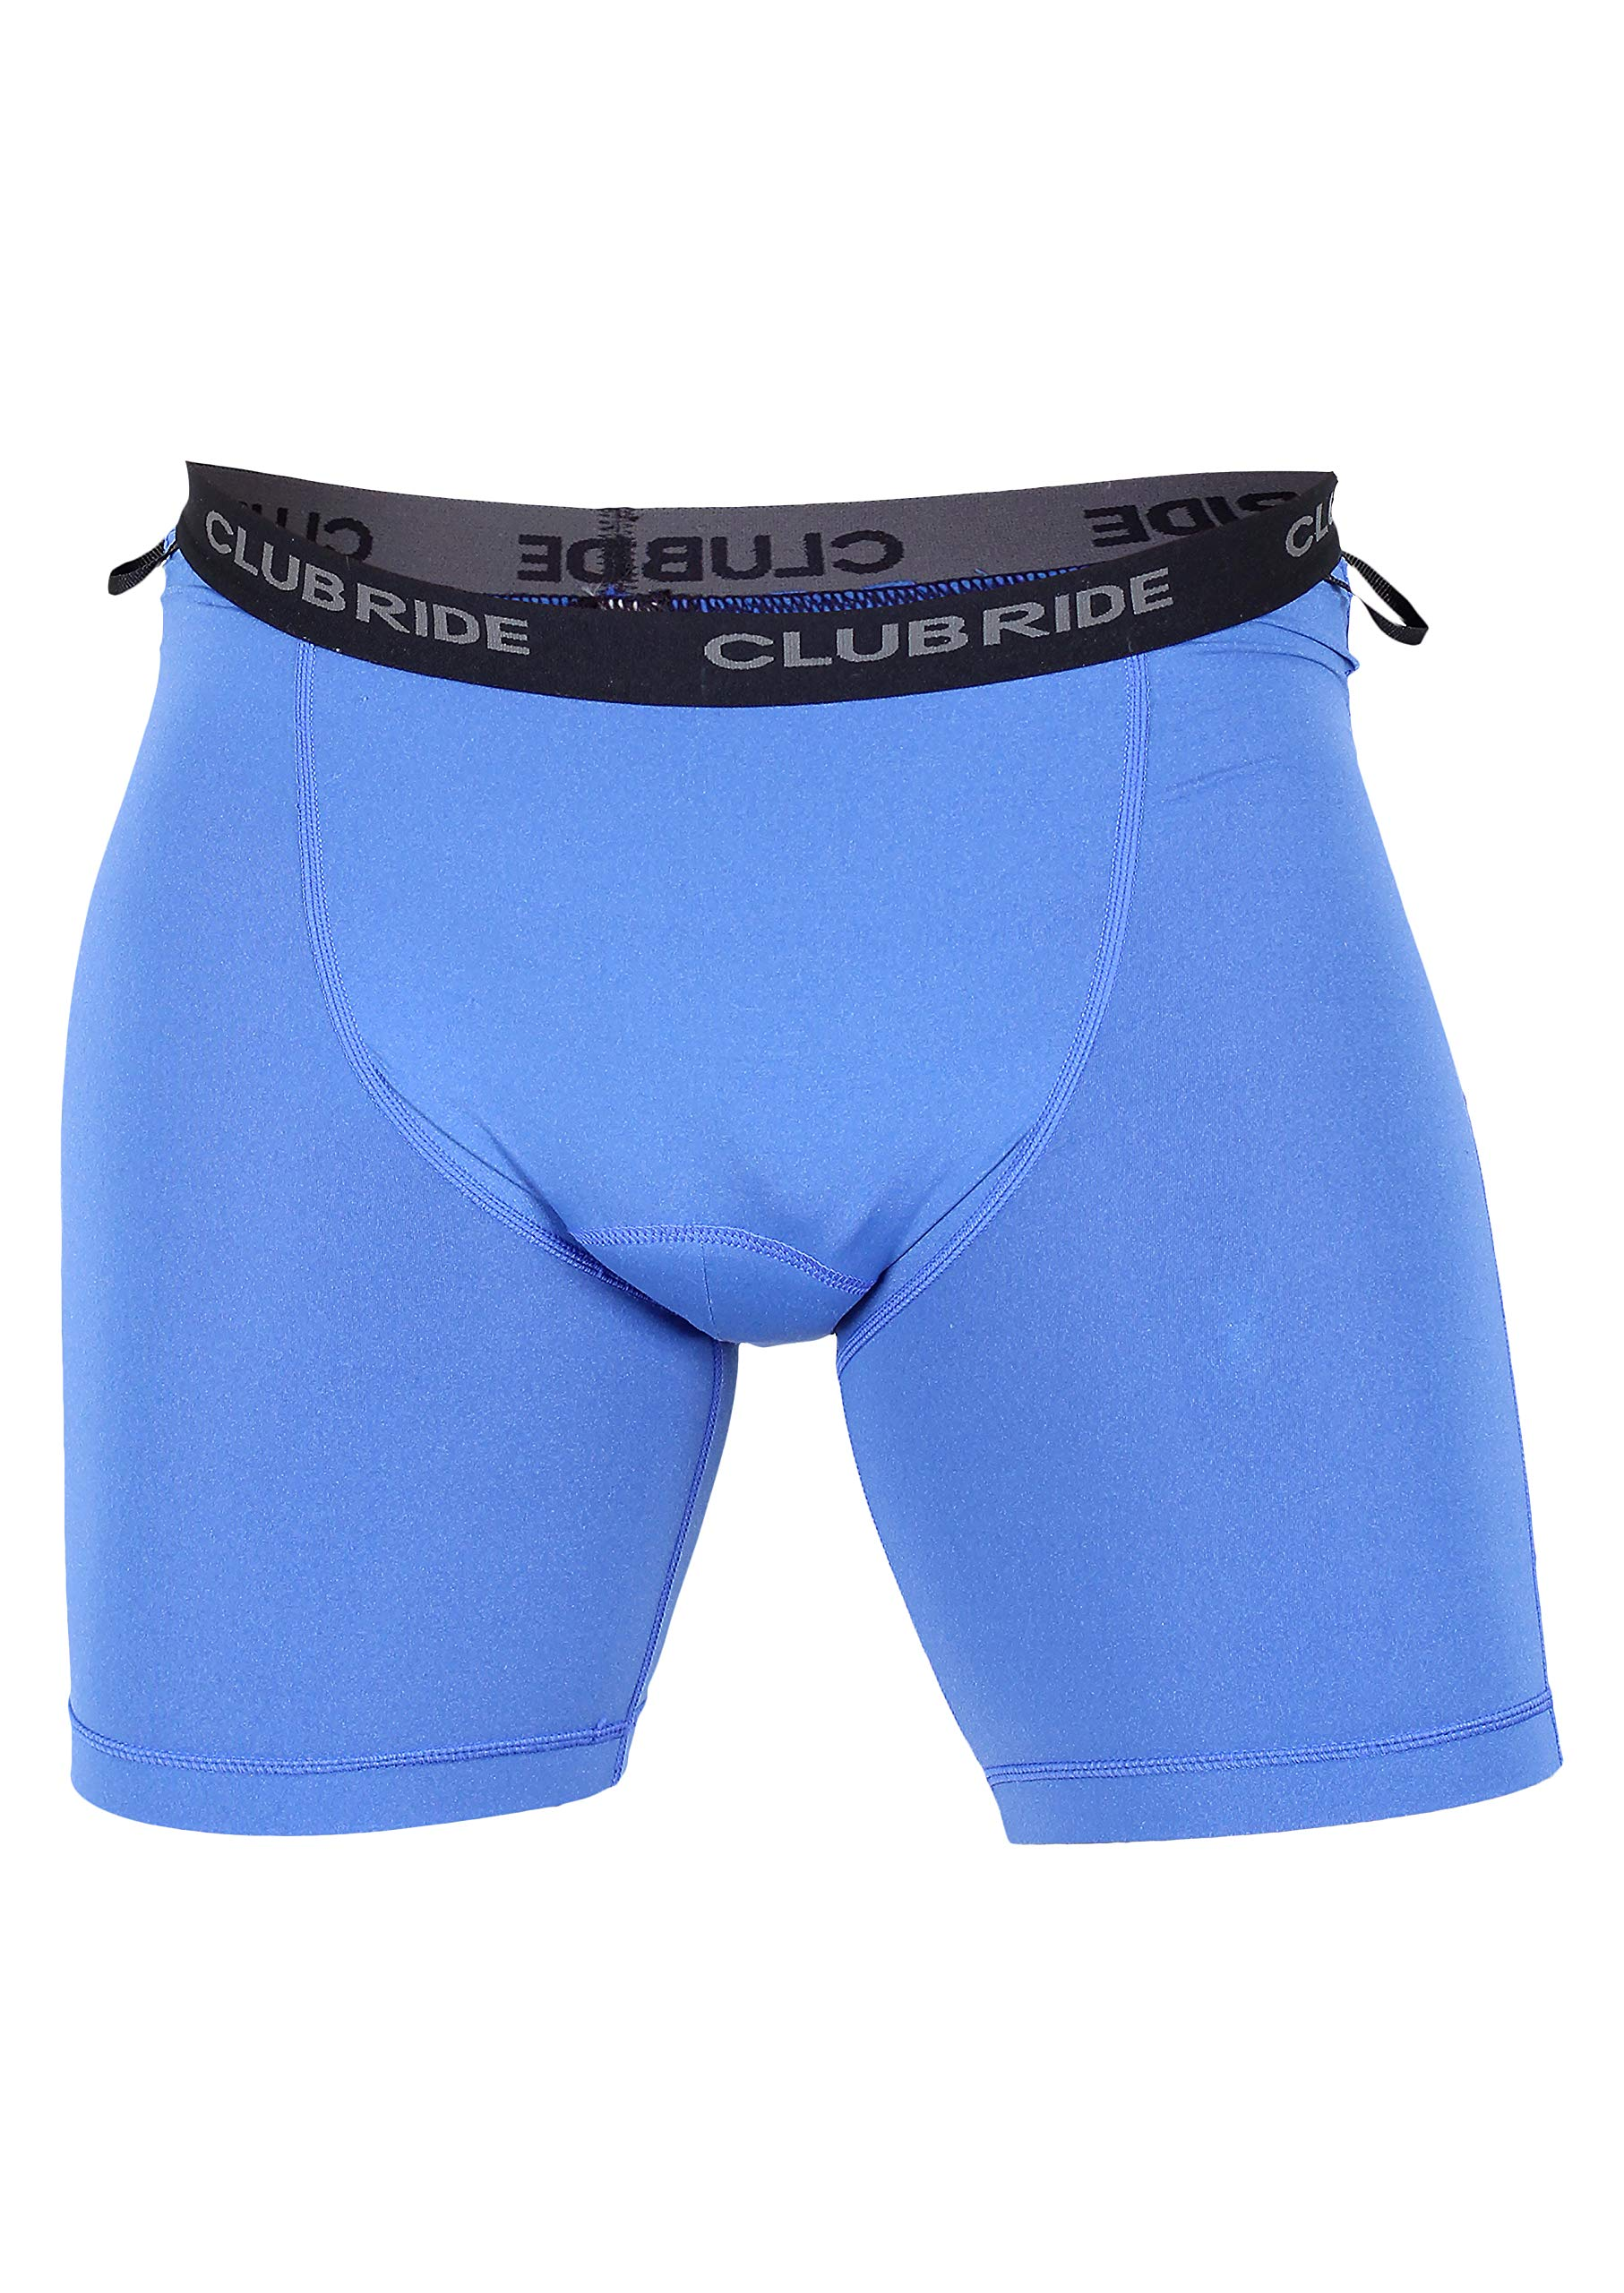 Club Ride Apparel Gunslinger 2 Hour Men's Cycling Shorts - Chamois Liner Small - Royal Blue